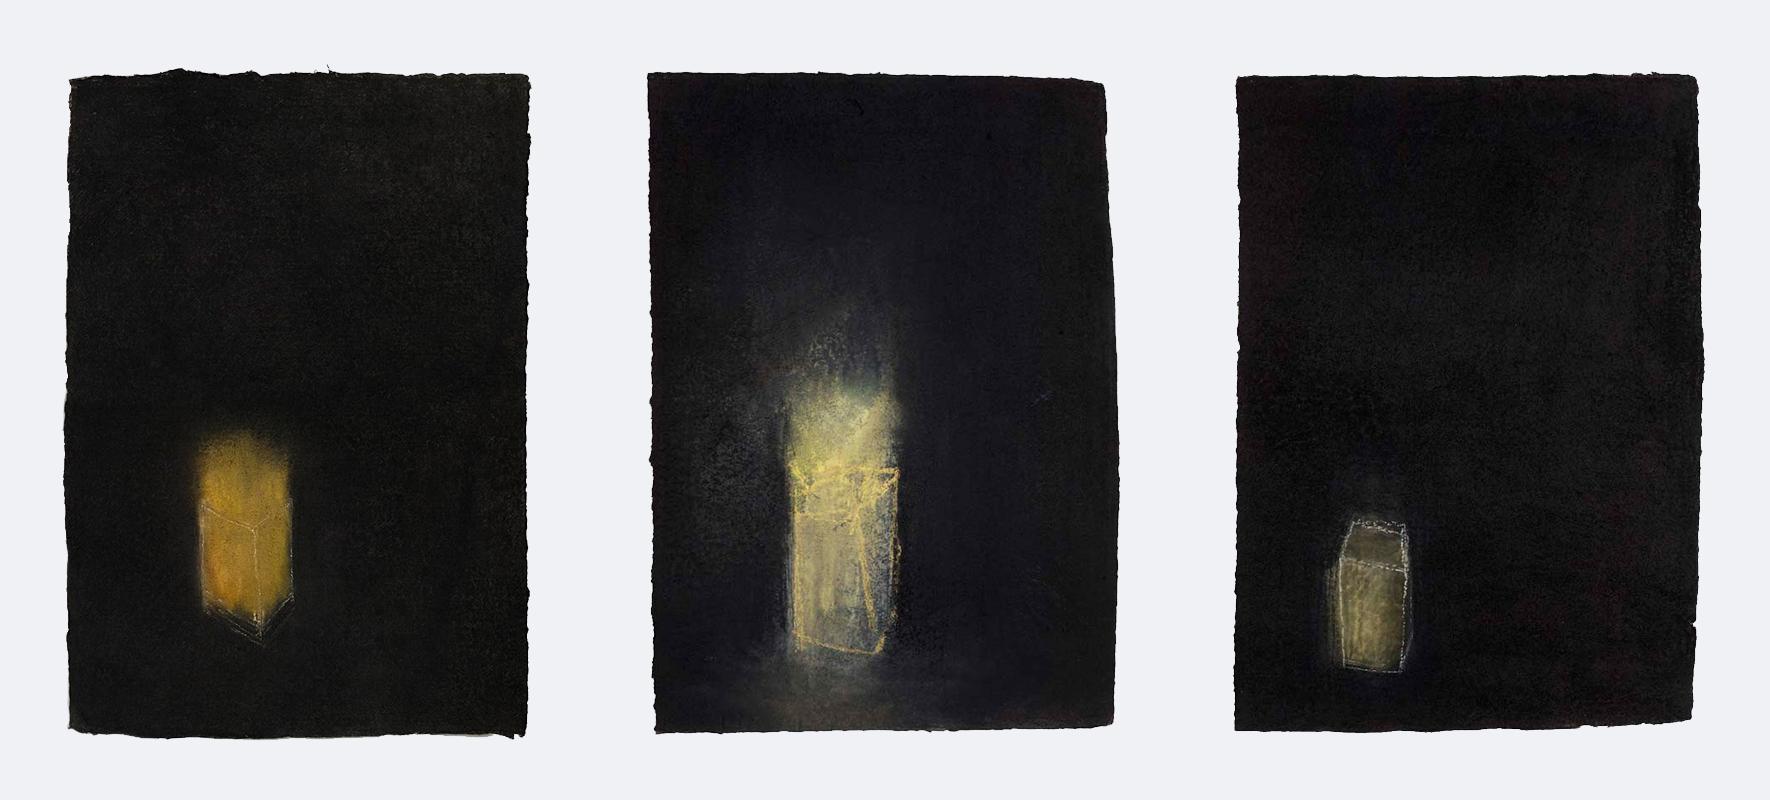 "Breath I, II & III, 2005. x 3 Charcoal & pastel on handmade khadi rag. Each drawing 590 x 380 mm (23 x 15"")"